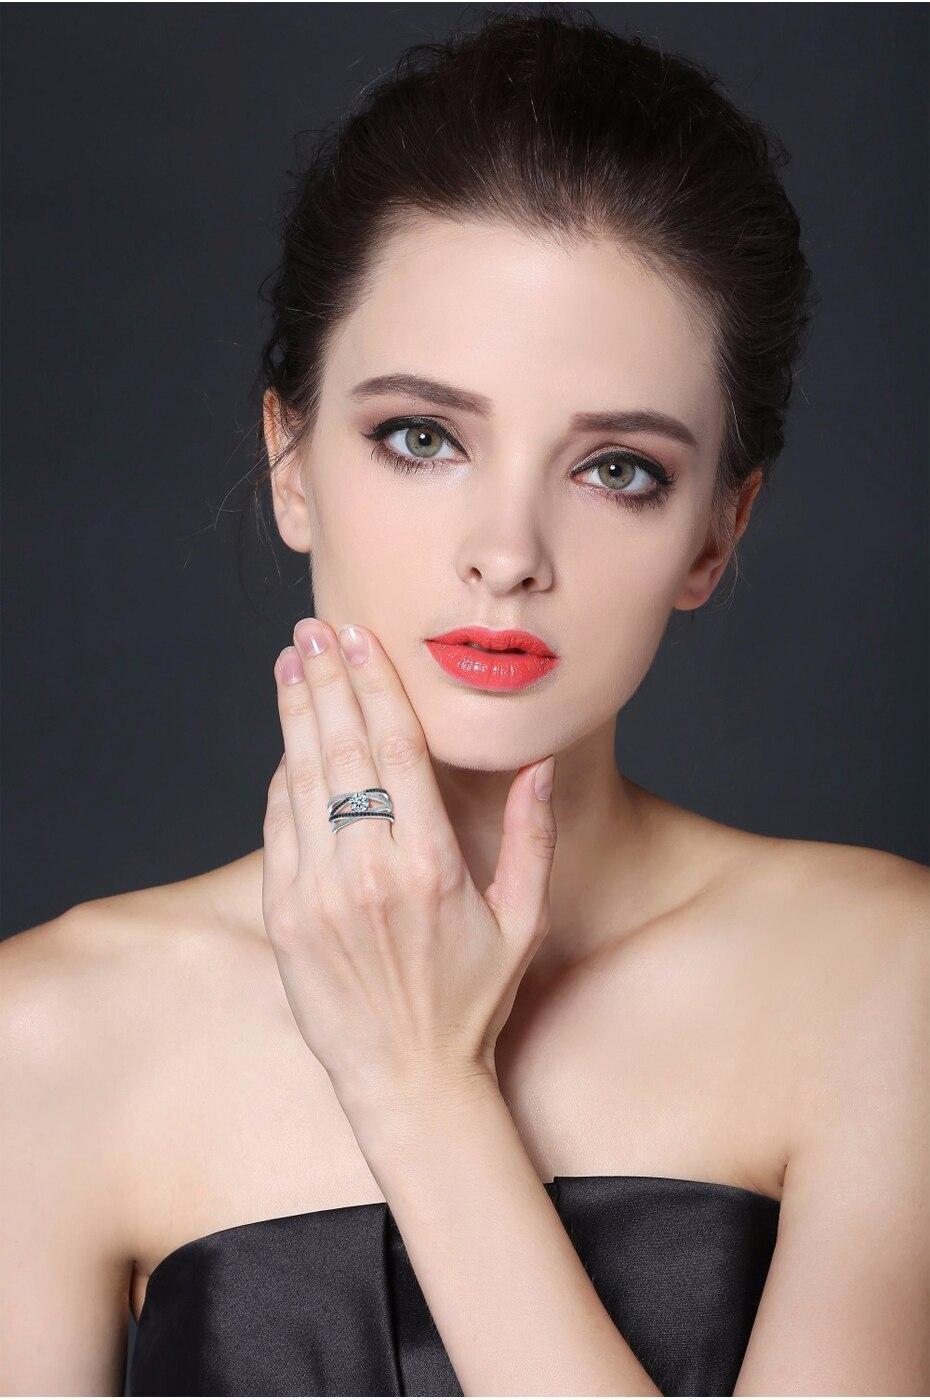 HTB1kJ15b5qAXuNjy1Xdq6yYcVXai [BLACK AWN] 925 Sterling Silver Rings for Women Hollow Engagement Ring Bijoux Bague Gift Sterling Silver Jewelry C012